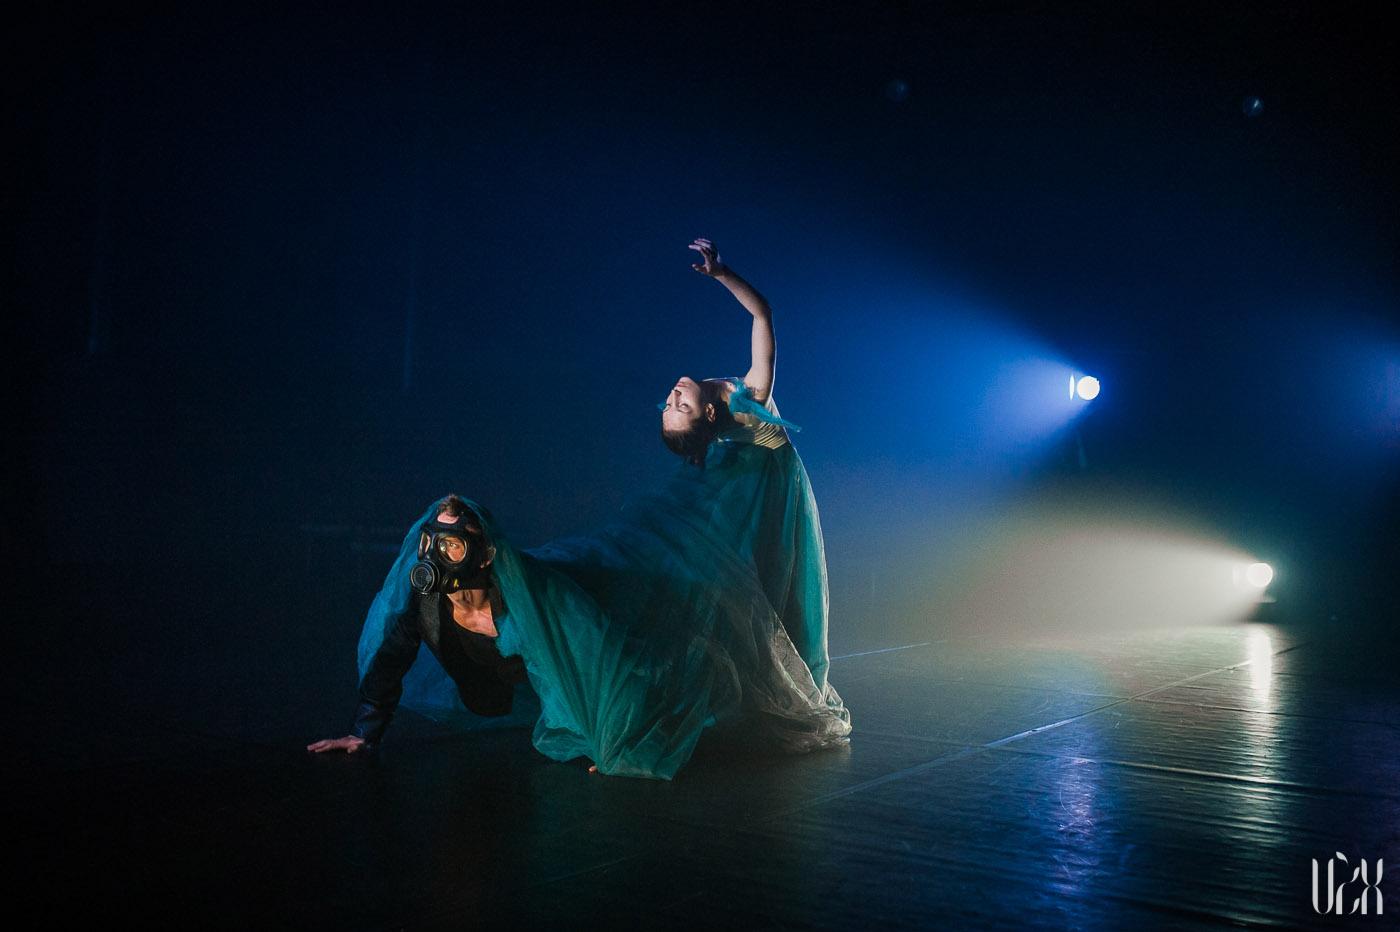 E.sabaliauskaite Vzx.lt Faustas Teatras Event 010